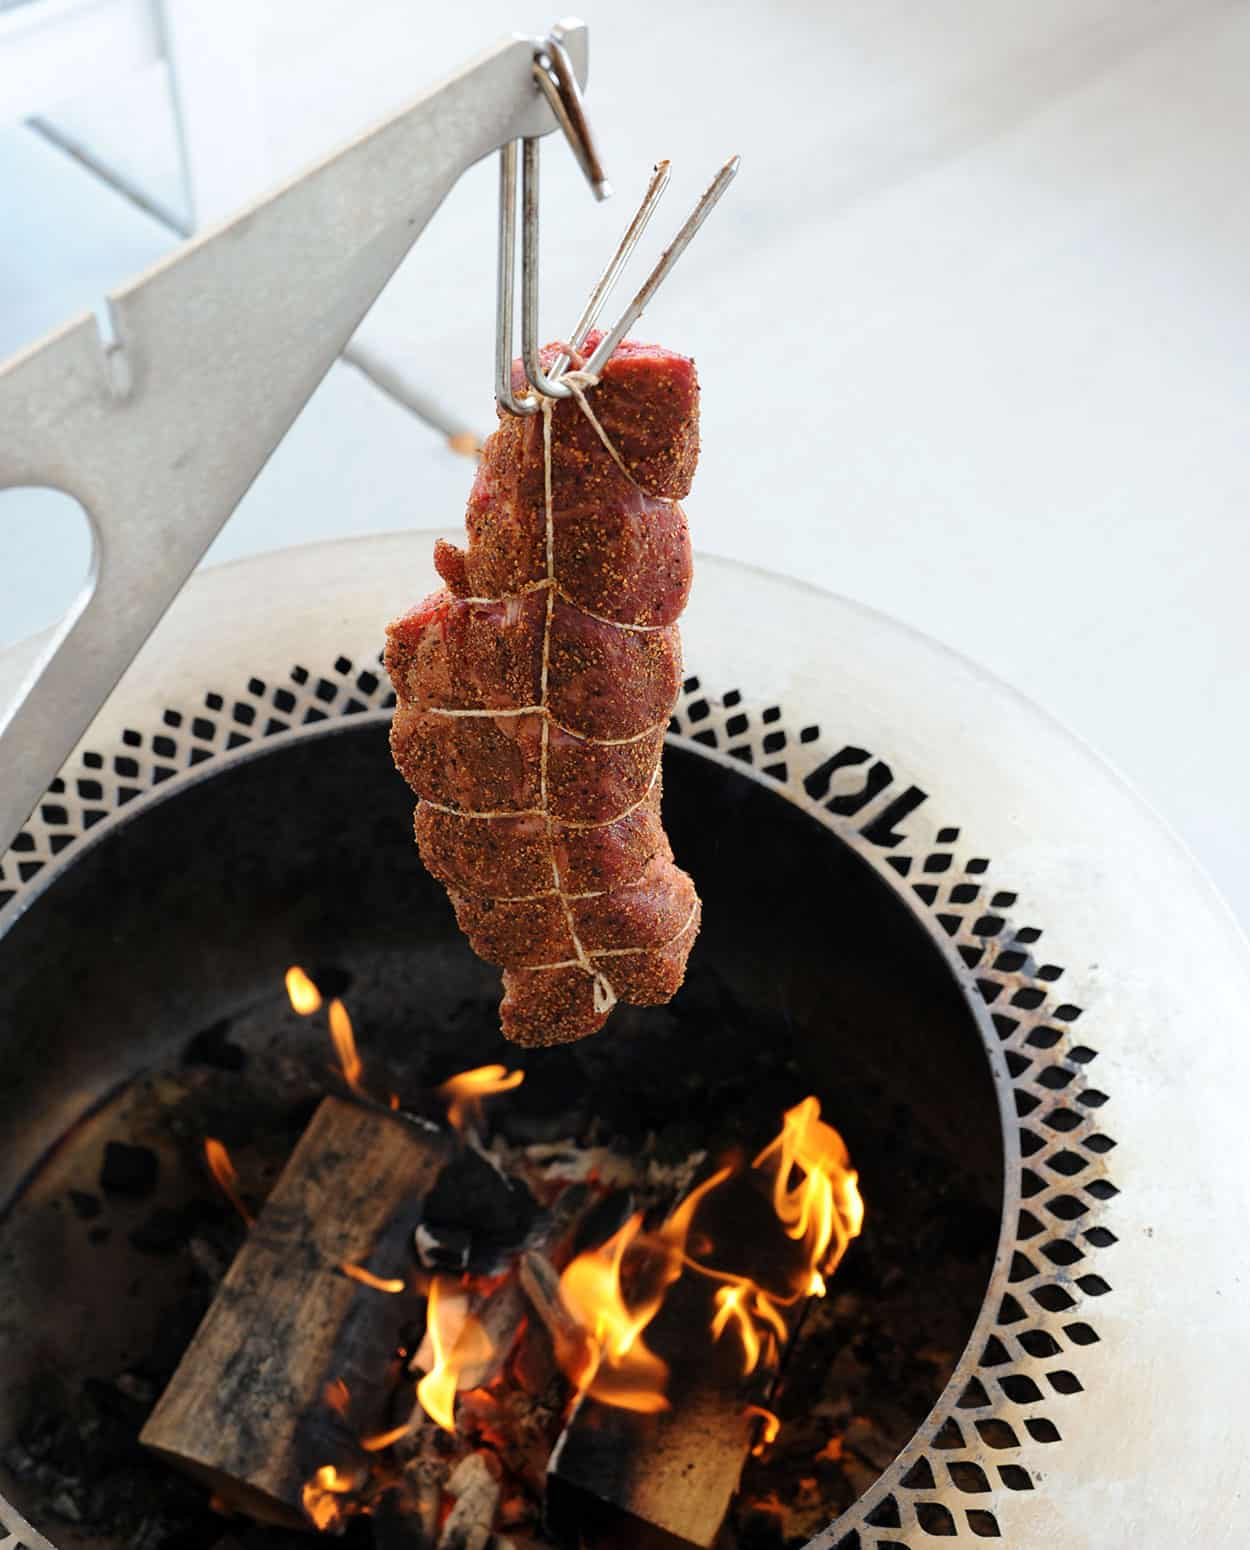 beef roast hanging over fire